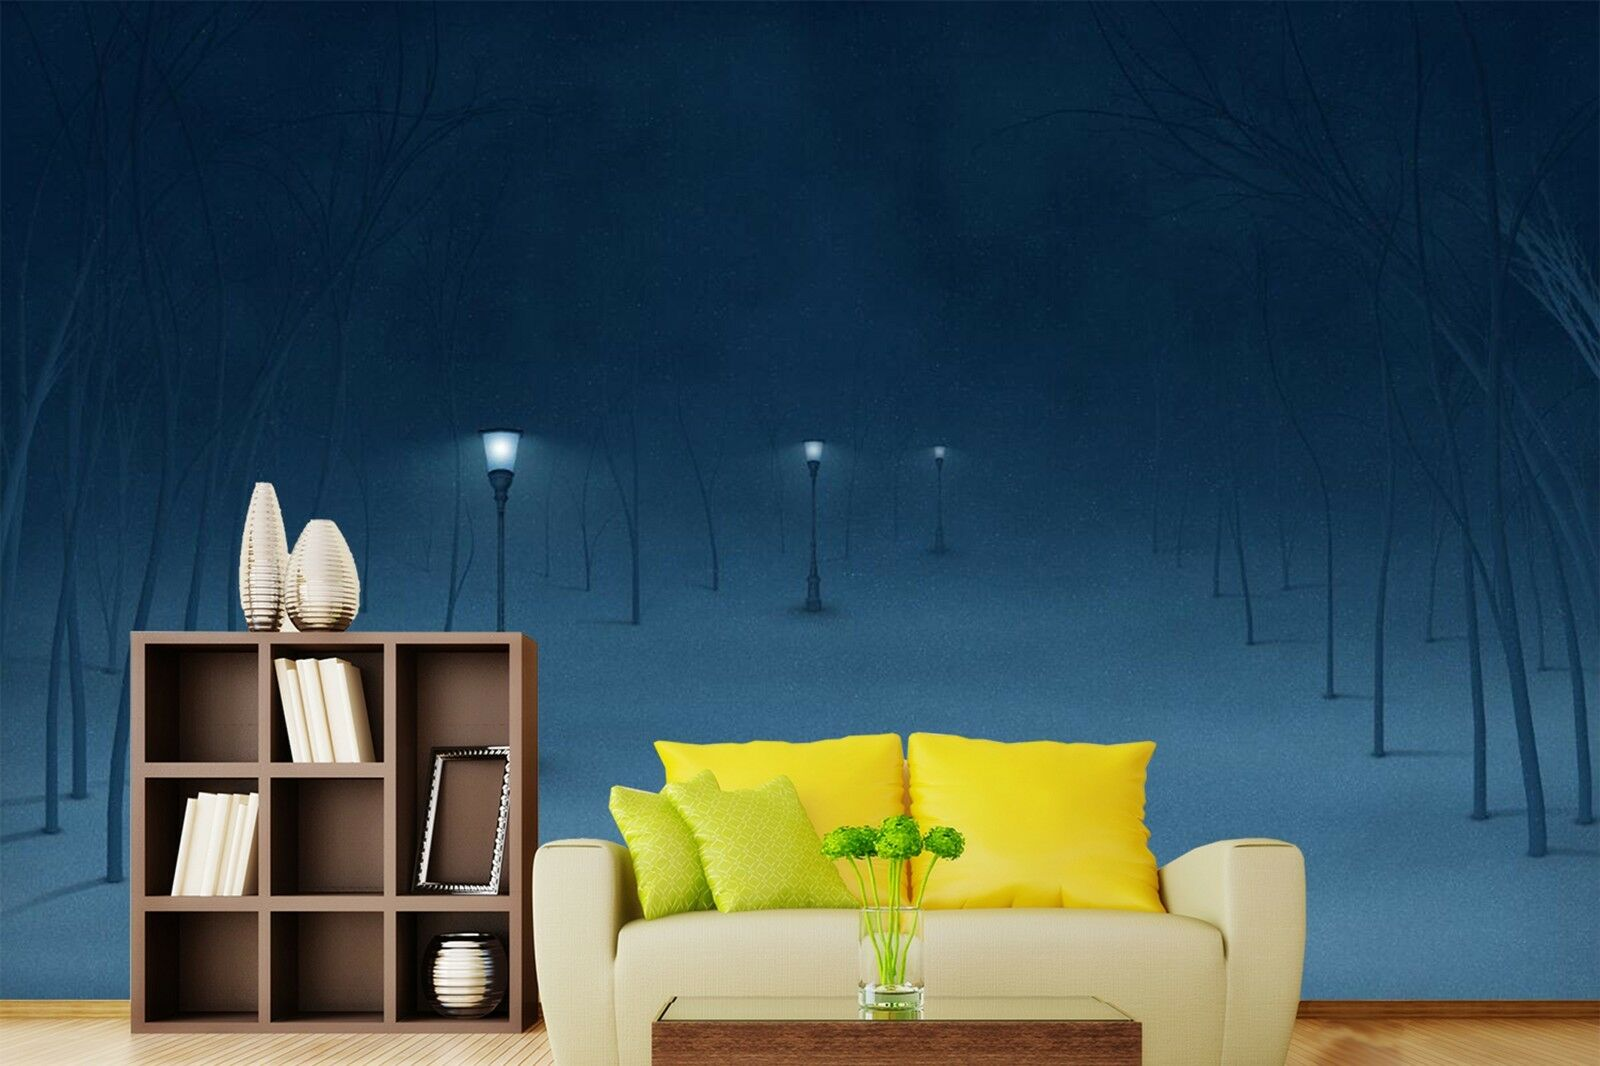 3D 3D 3D Licht Winter Nacht 9655 Tapete Wandgemälde Tapeten Bild Familie DE Lemon 00dbc3